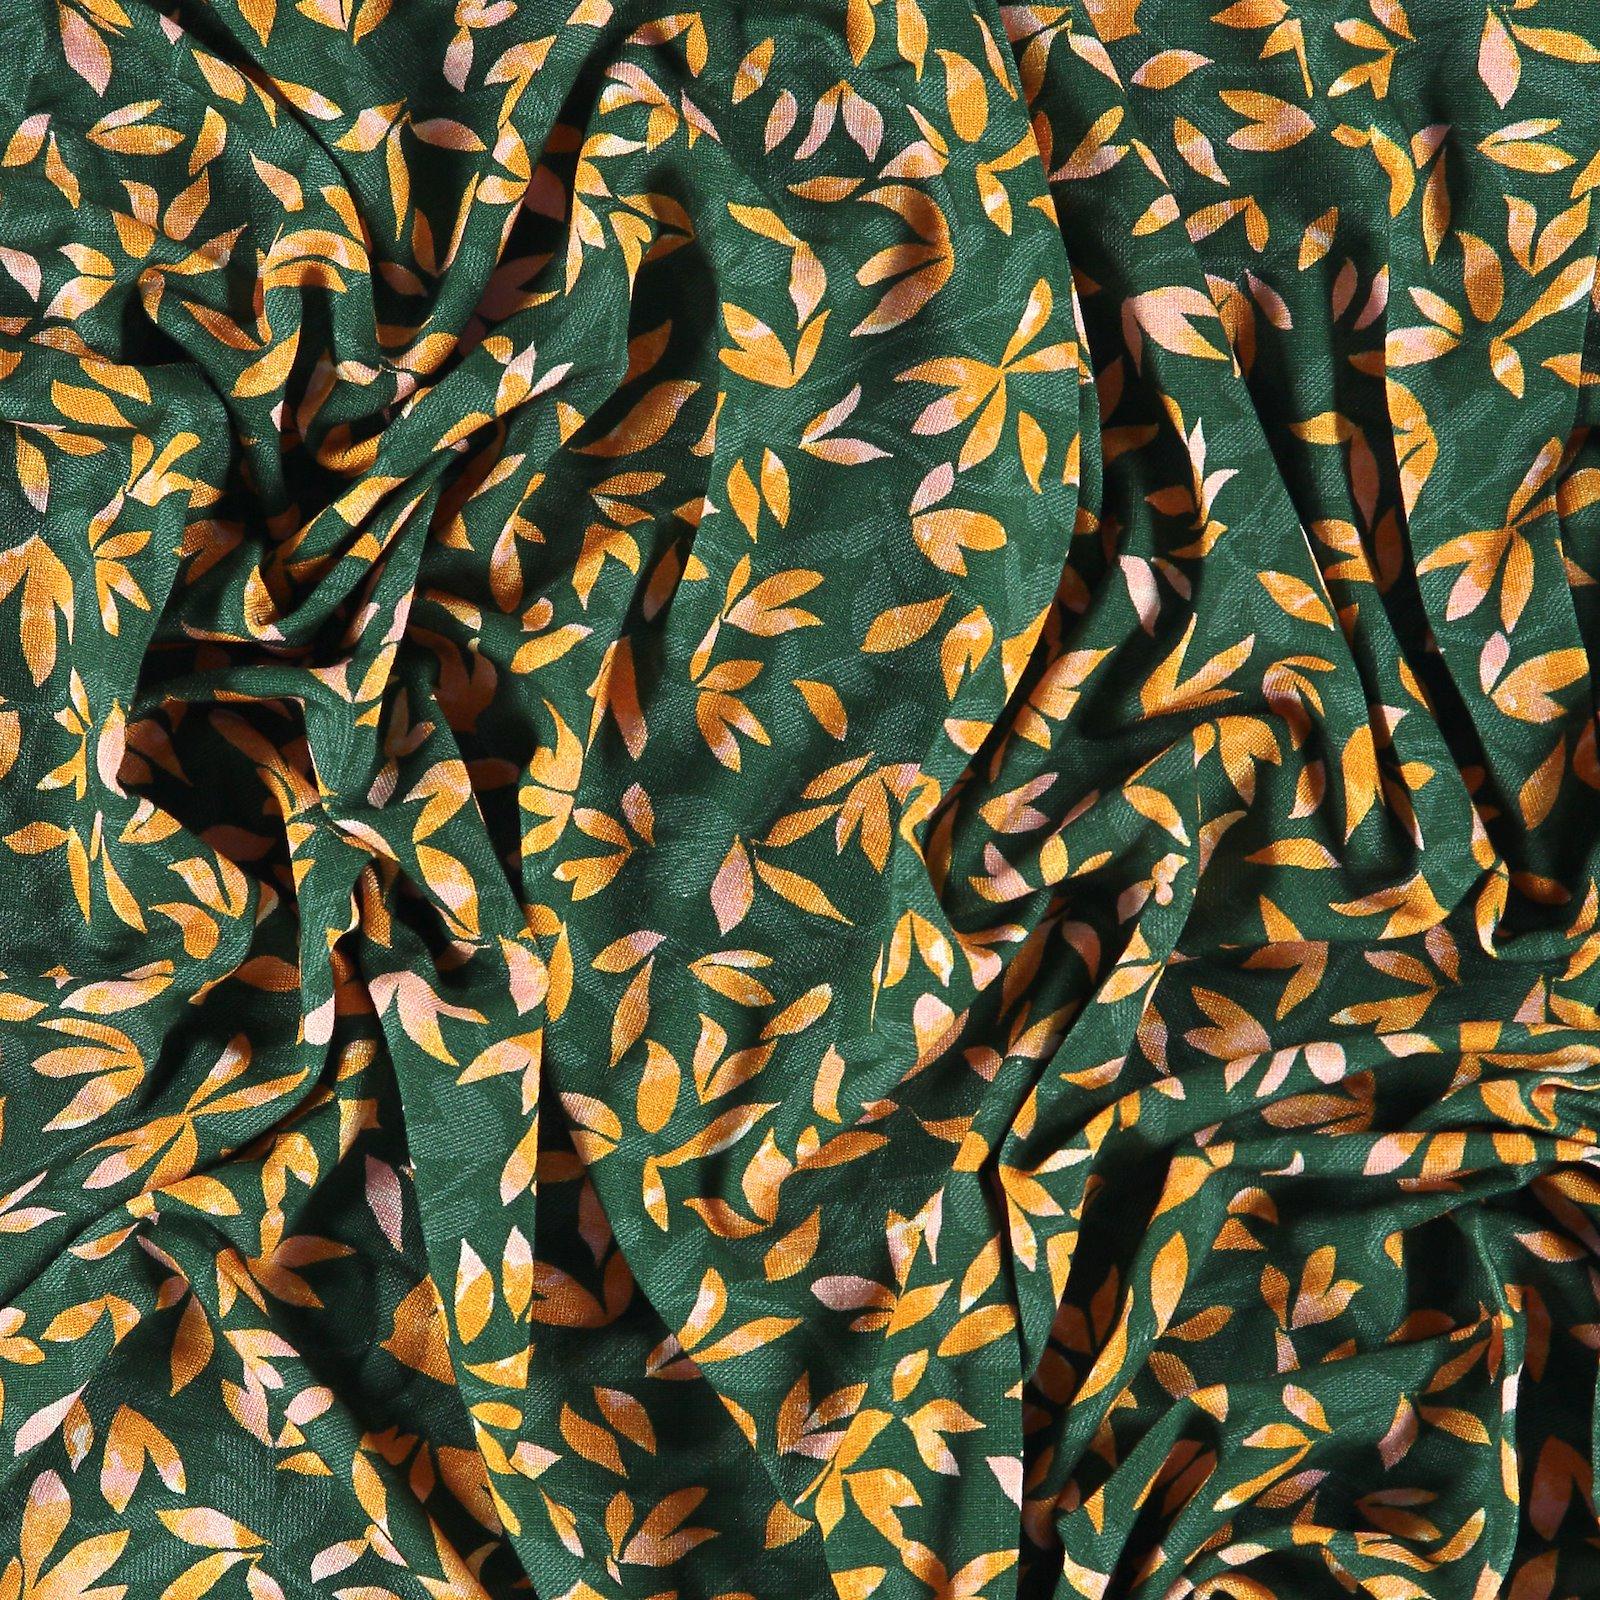 Viscose stretch jersey dark green w leaf